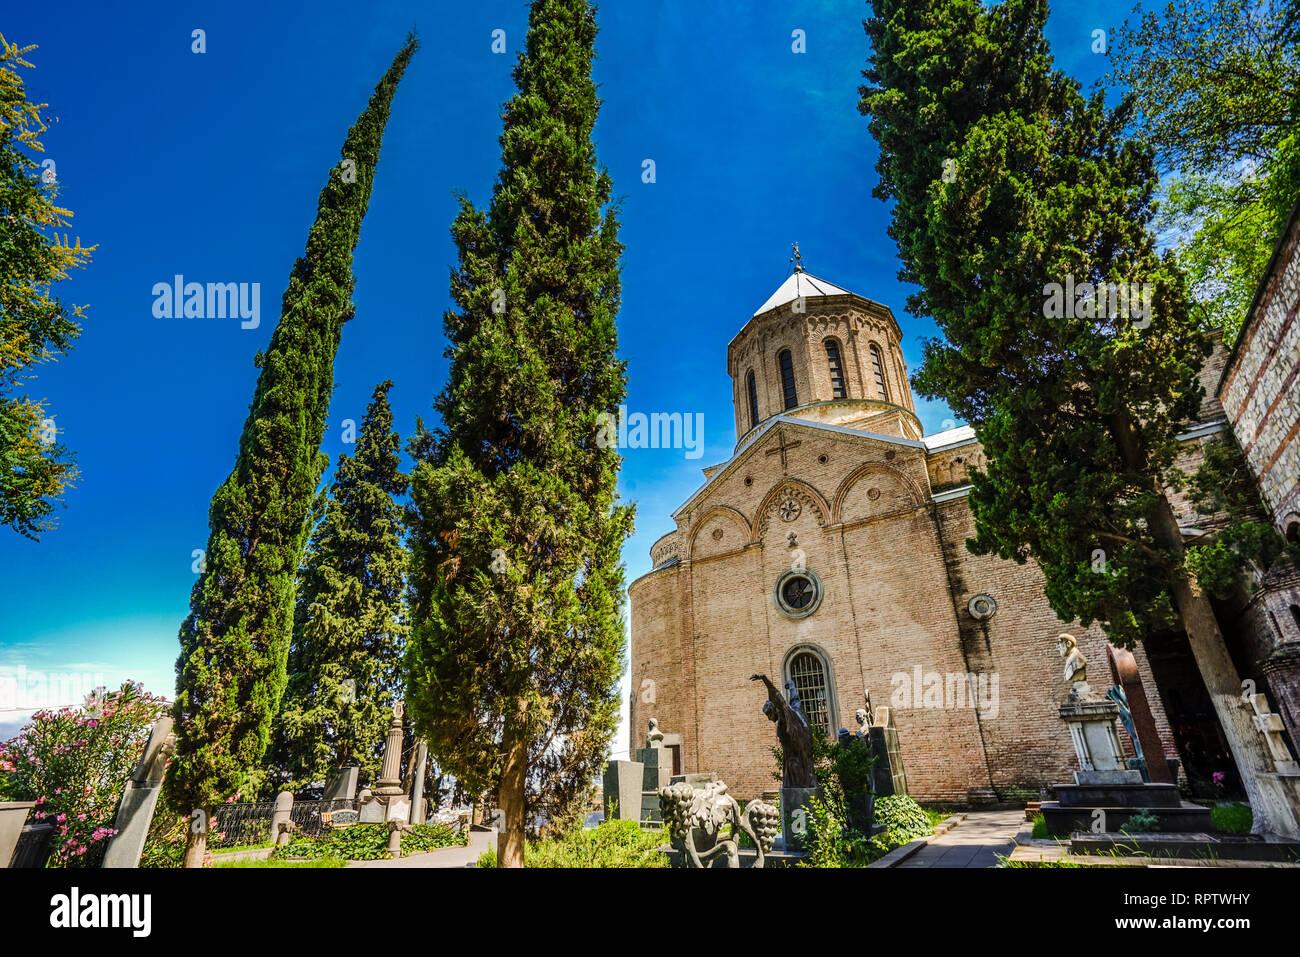 Mtatsminda Pantheon rund um die St. David Kirche in Tiflis, Georgien Stockbild